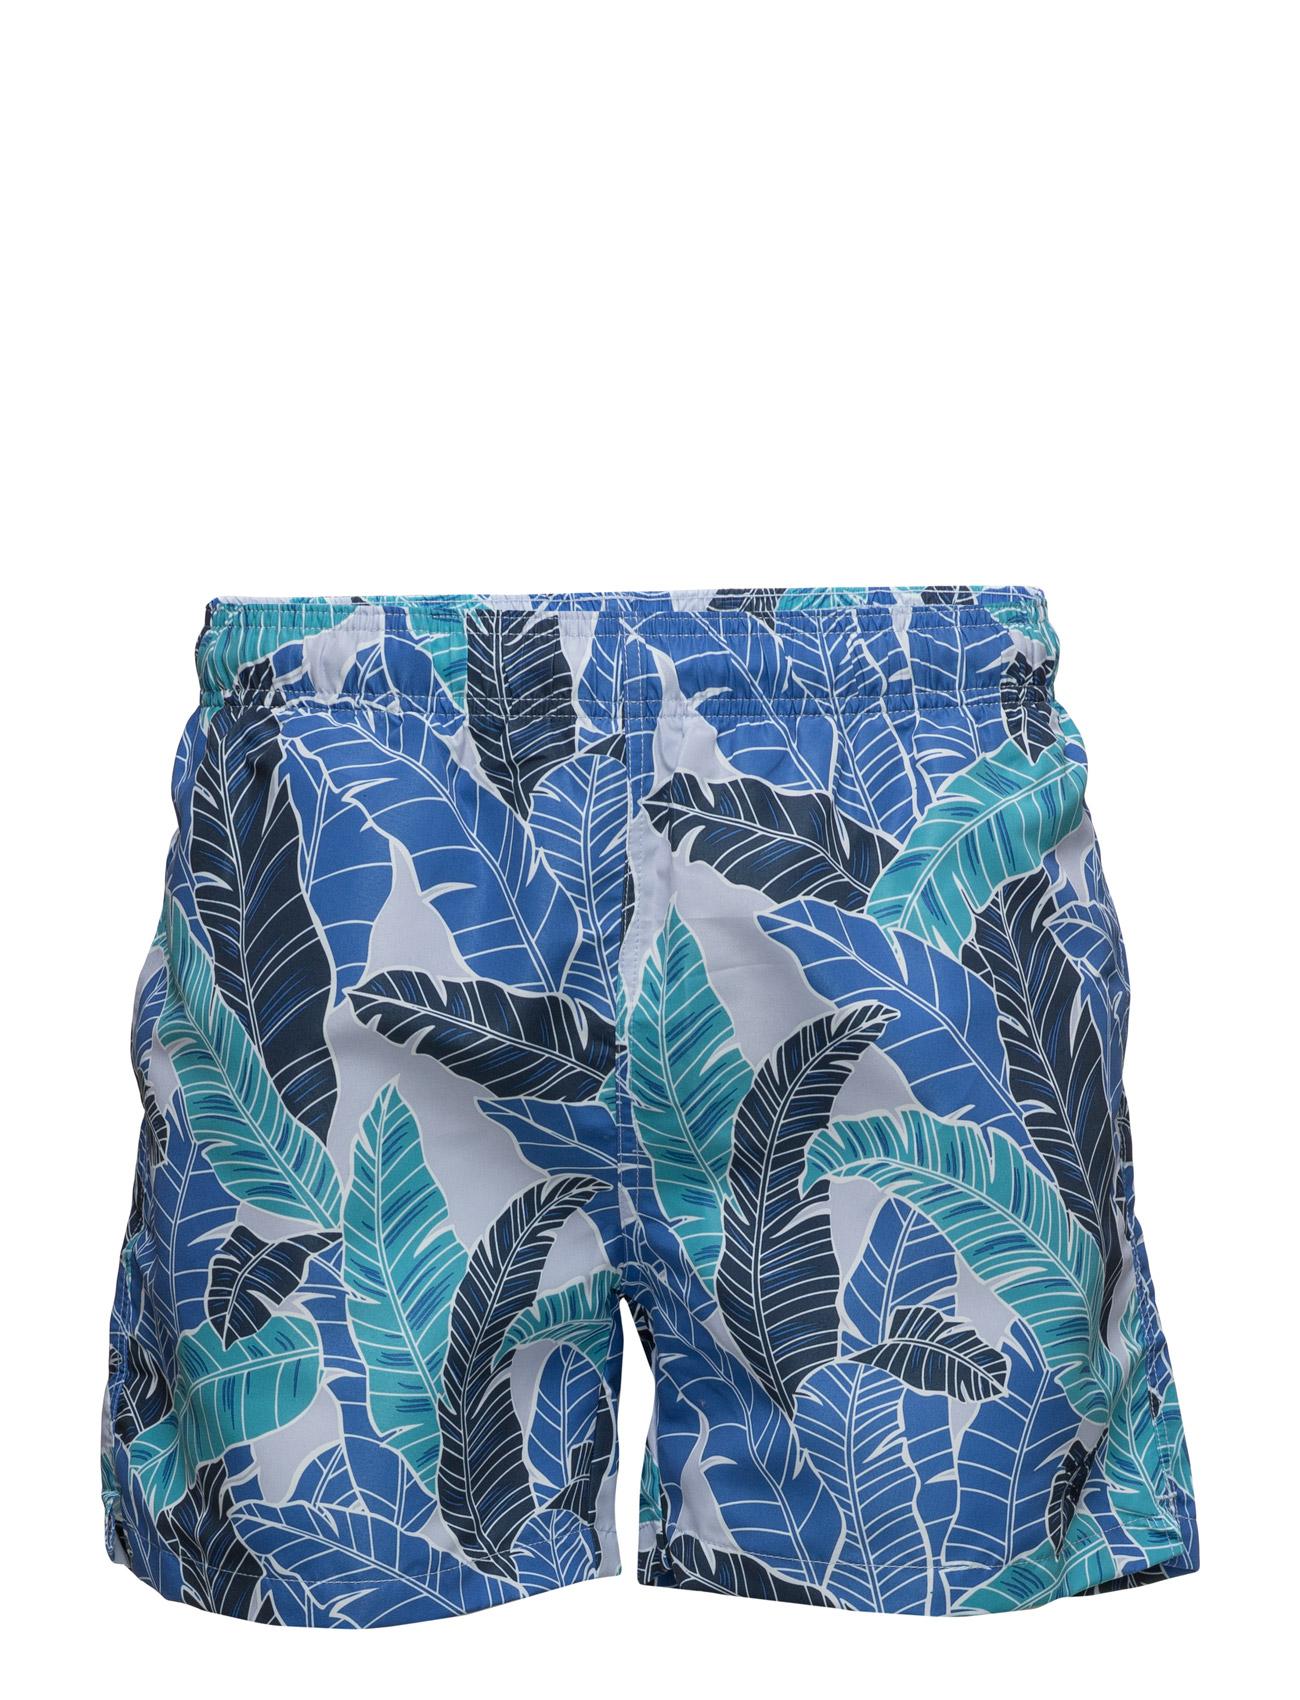 gant – Banana leaves swim shorts c.f på boozt.com dk